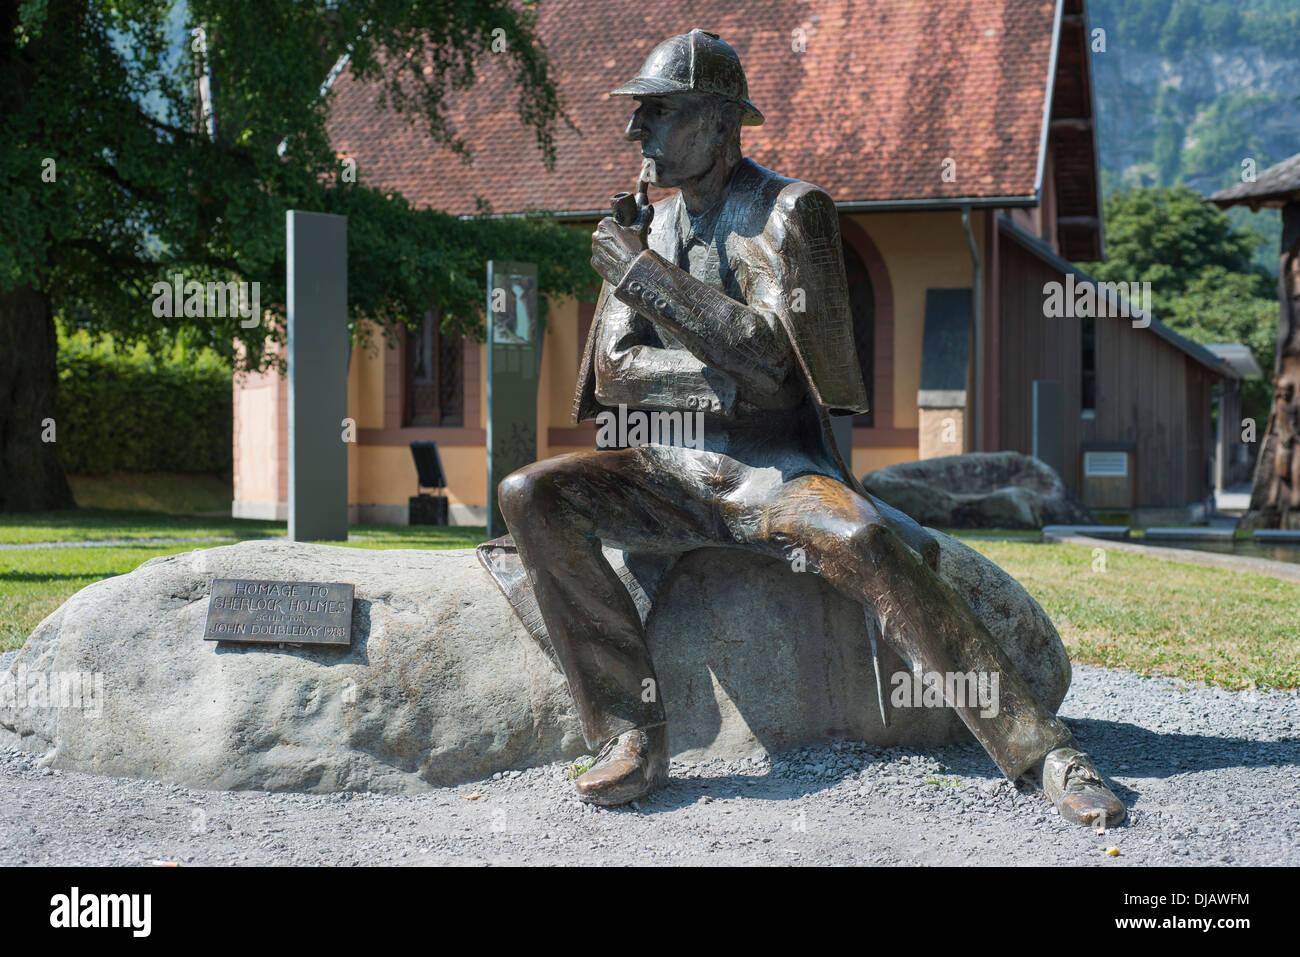 Bronze statue of Sherlock Holmes in the city center, Meiringen, Canton of Bern, Switzerland - Stock Image